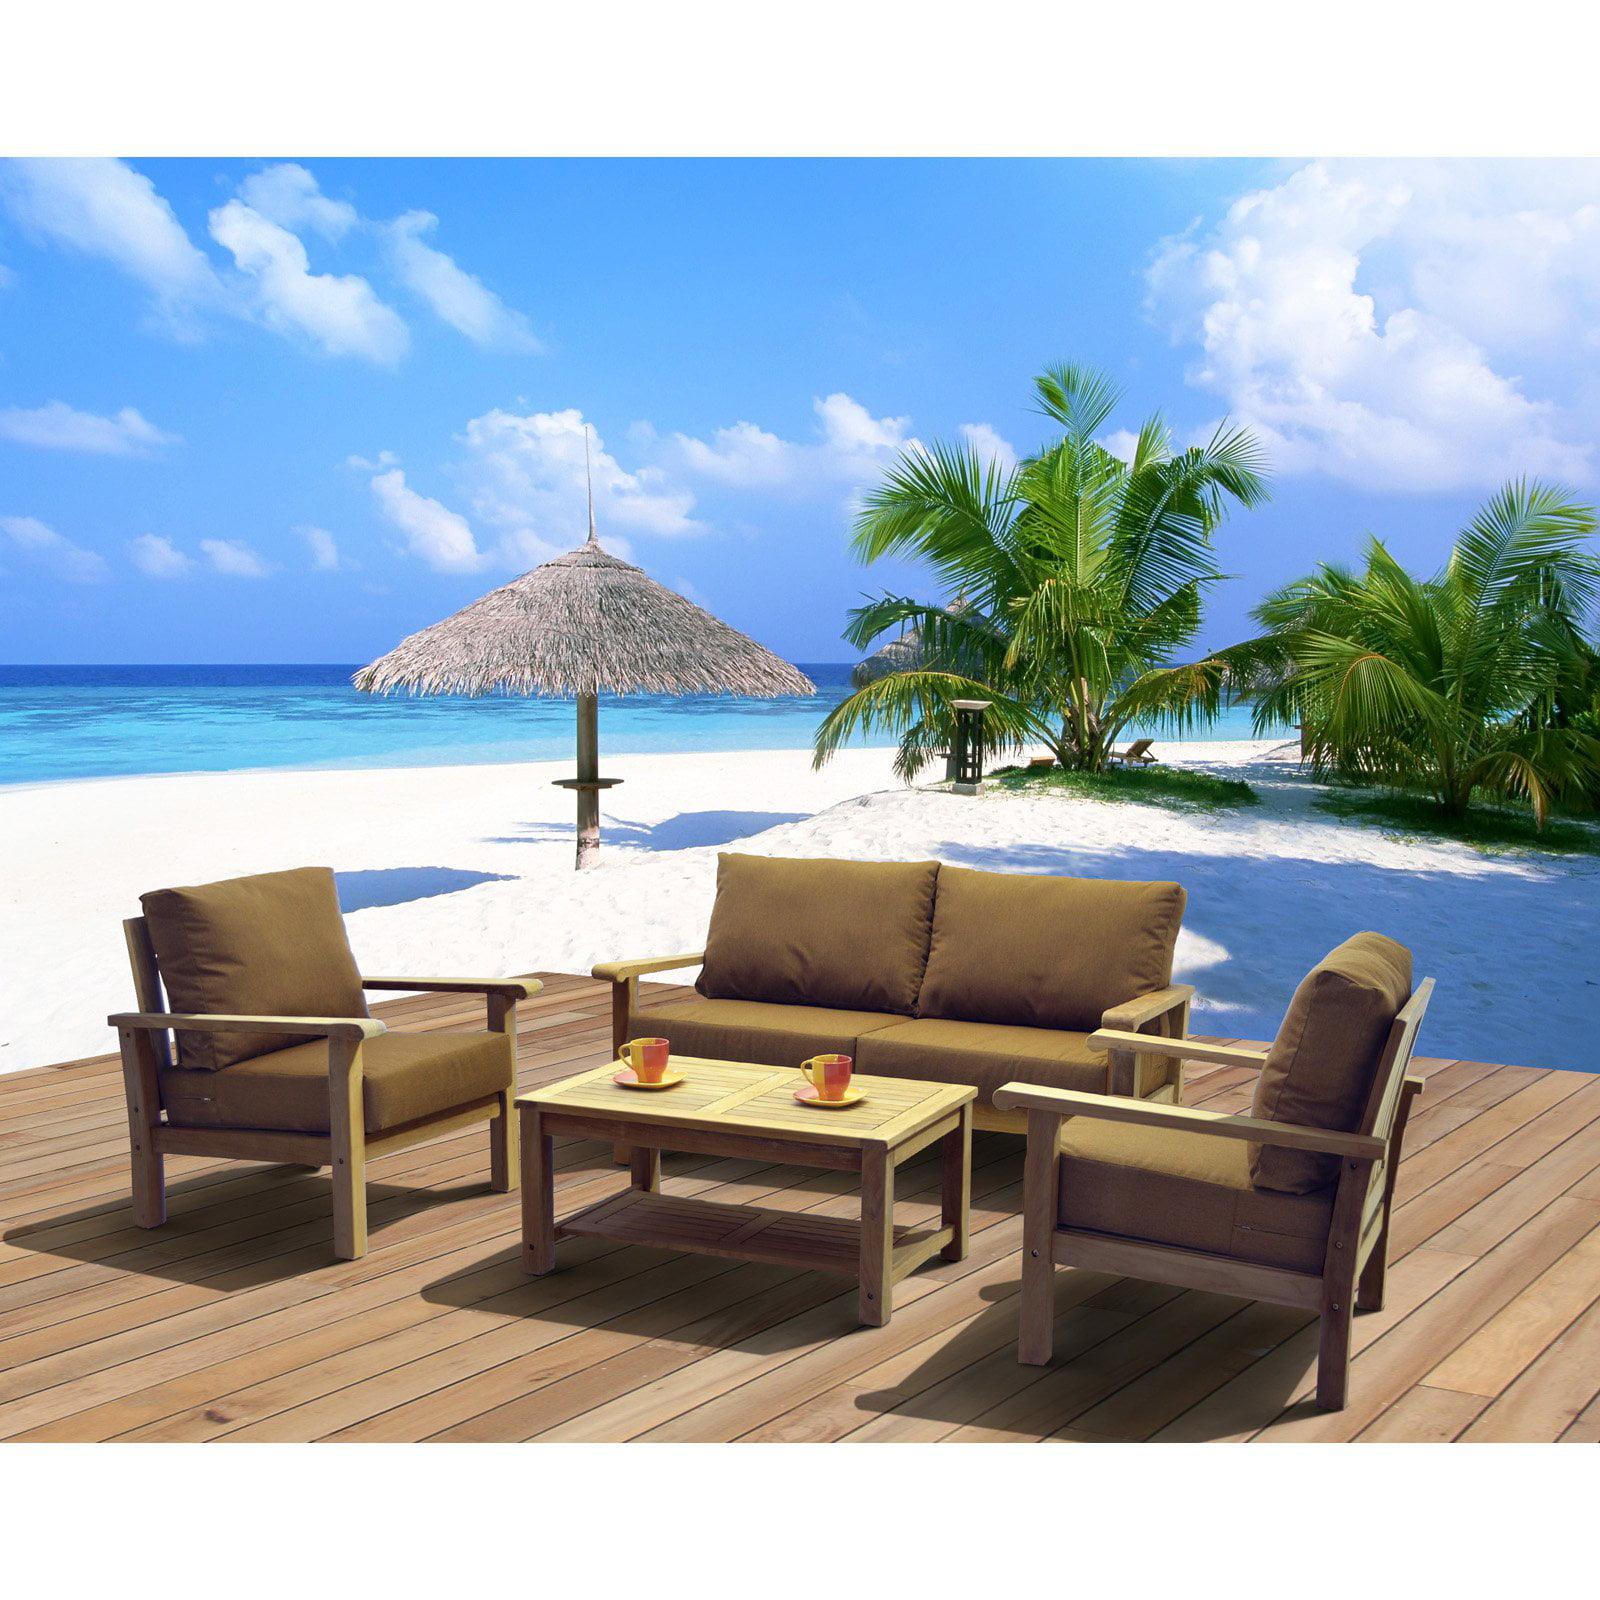 Amazonia St. Peter Teak Deep Seat Conversation Set with Sunbrella Cushions - Seats 4